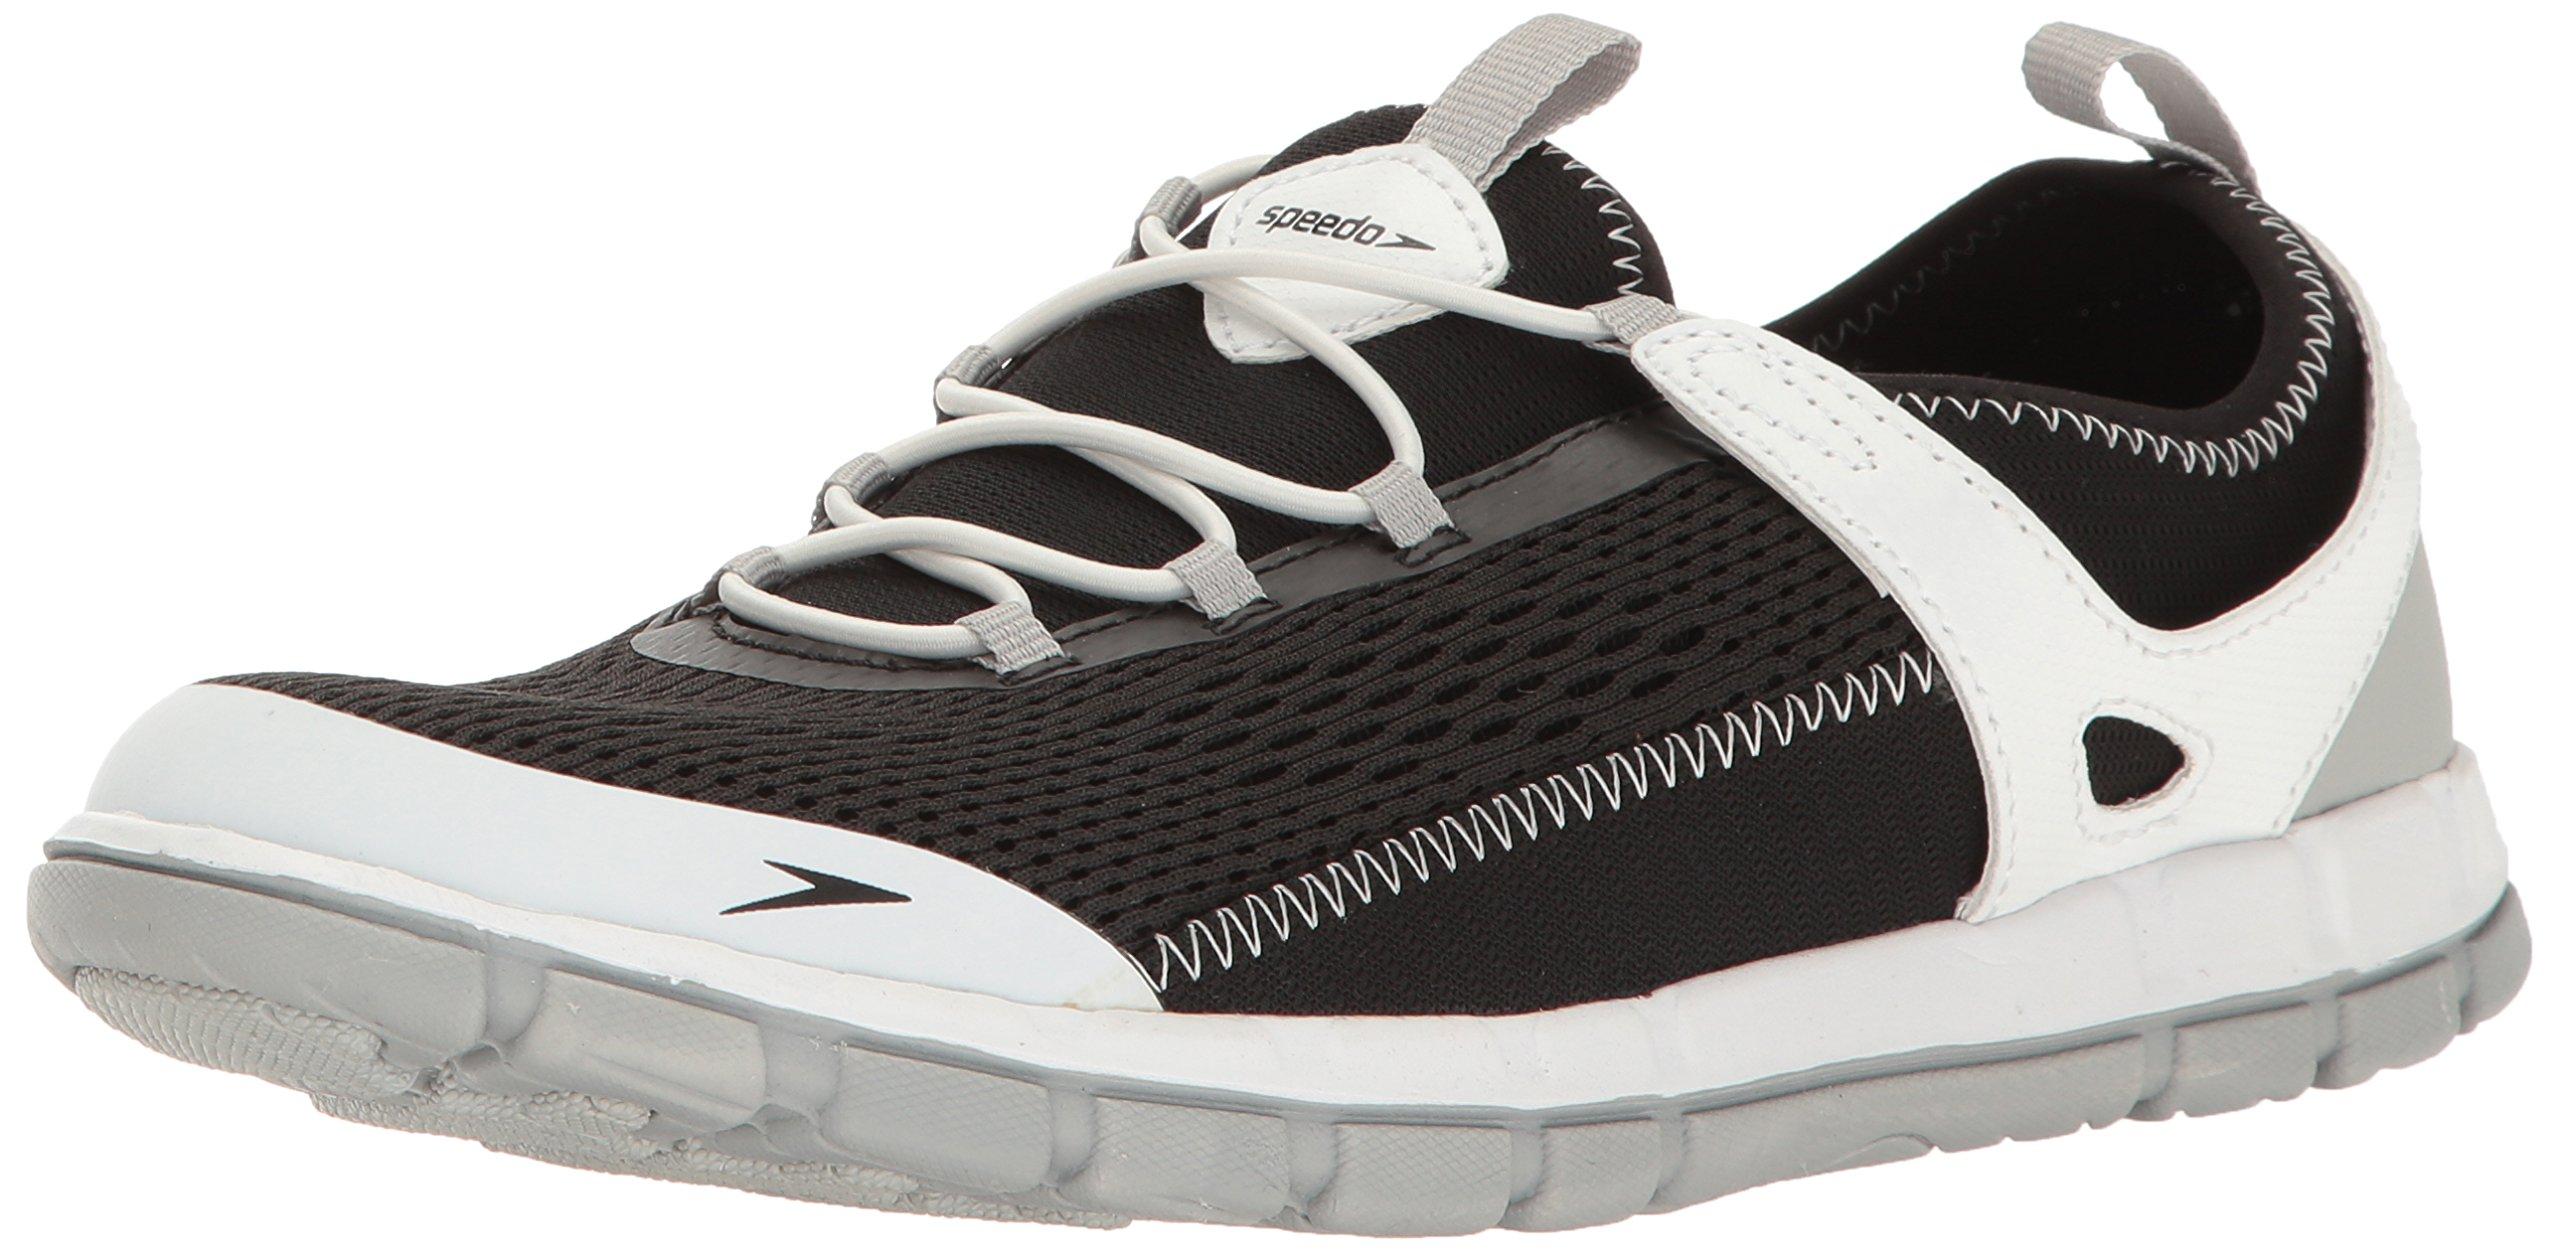 Speedo Women's The Wake Athletic Water Shoe, Black/White, 8 C/D US